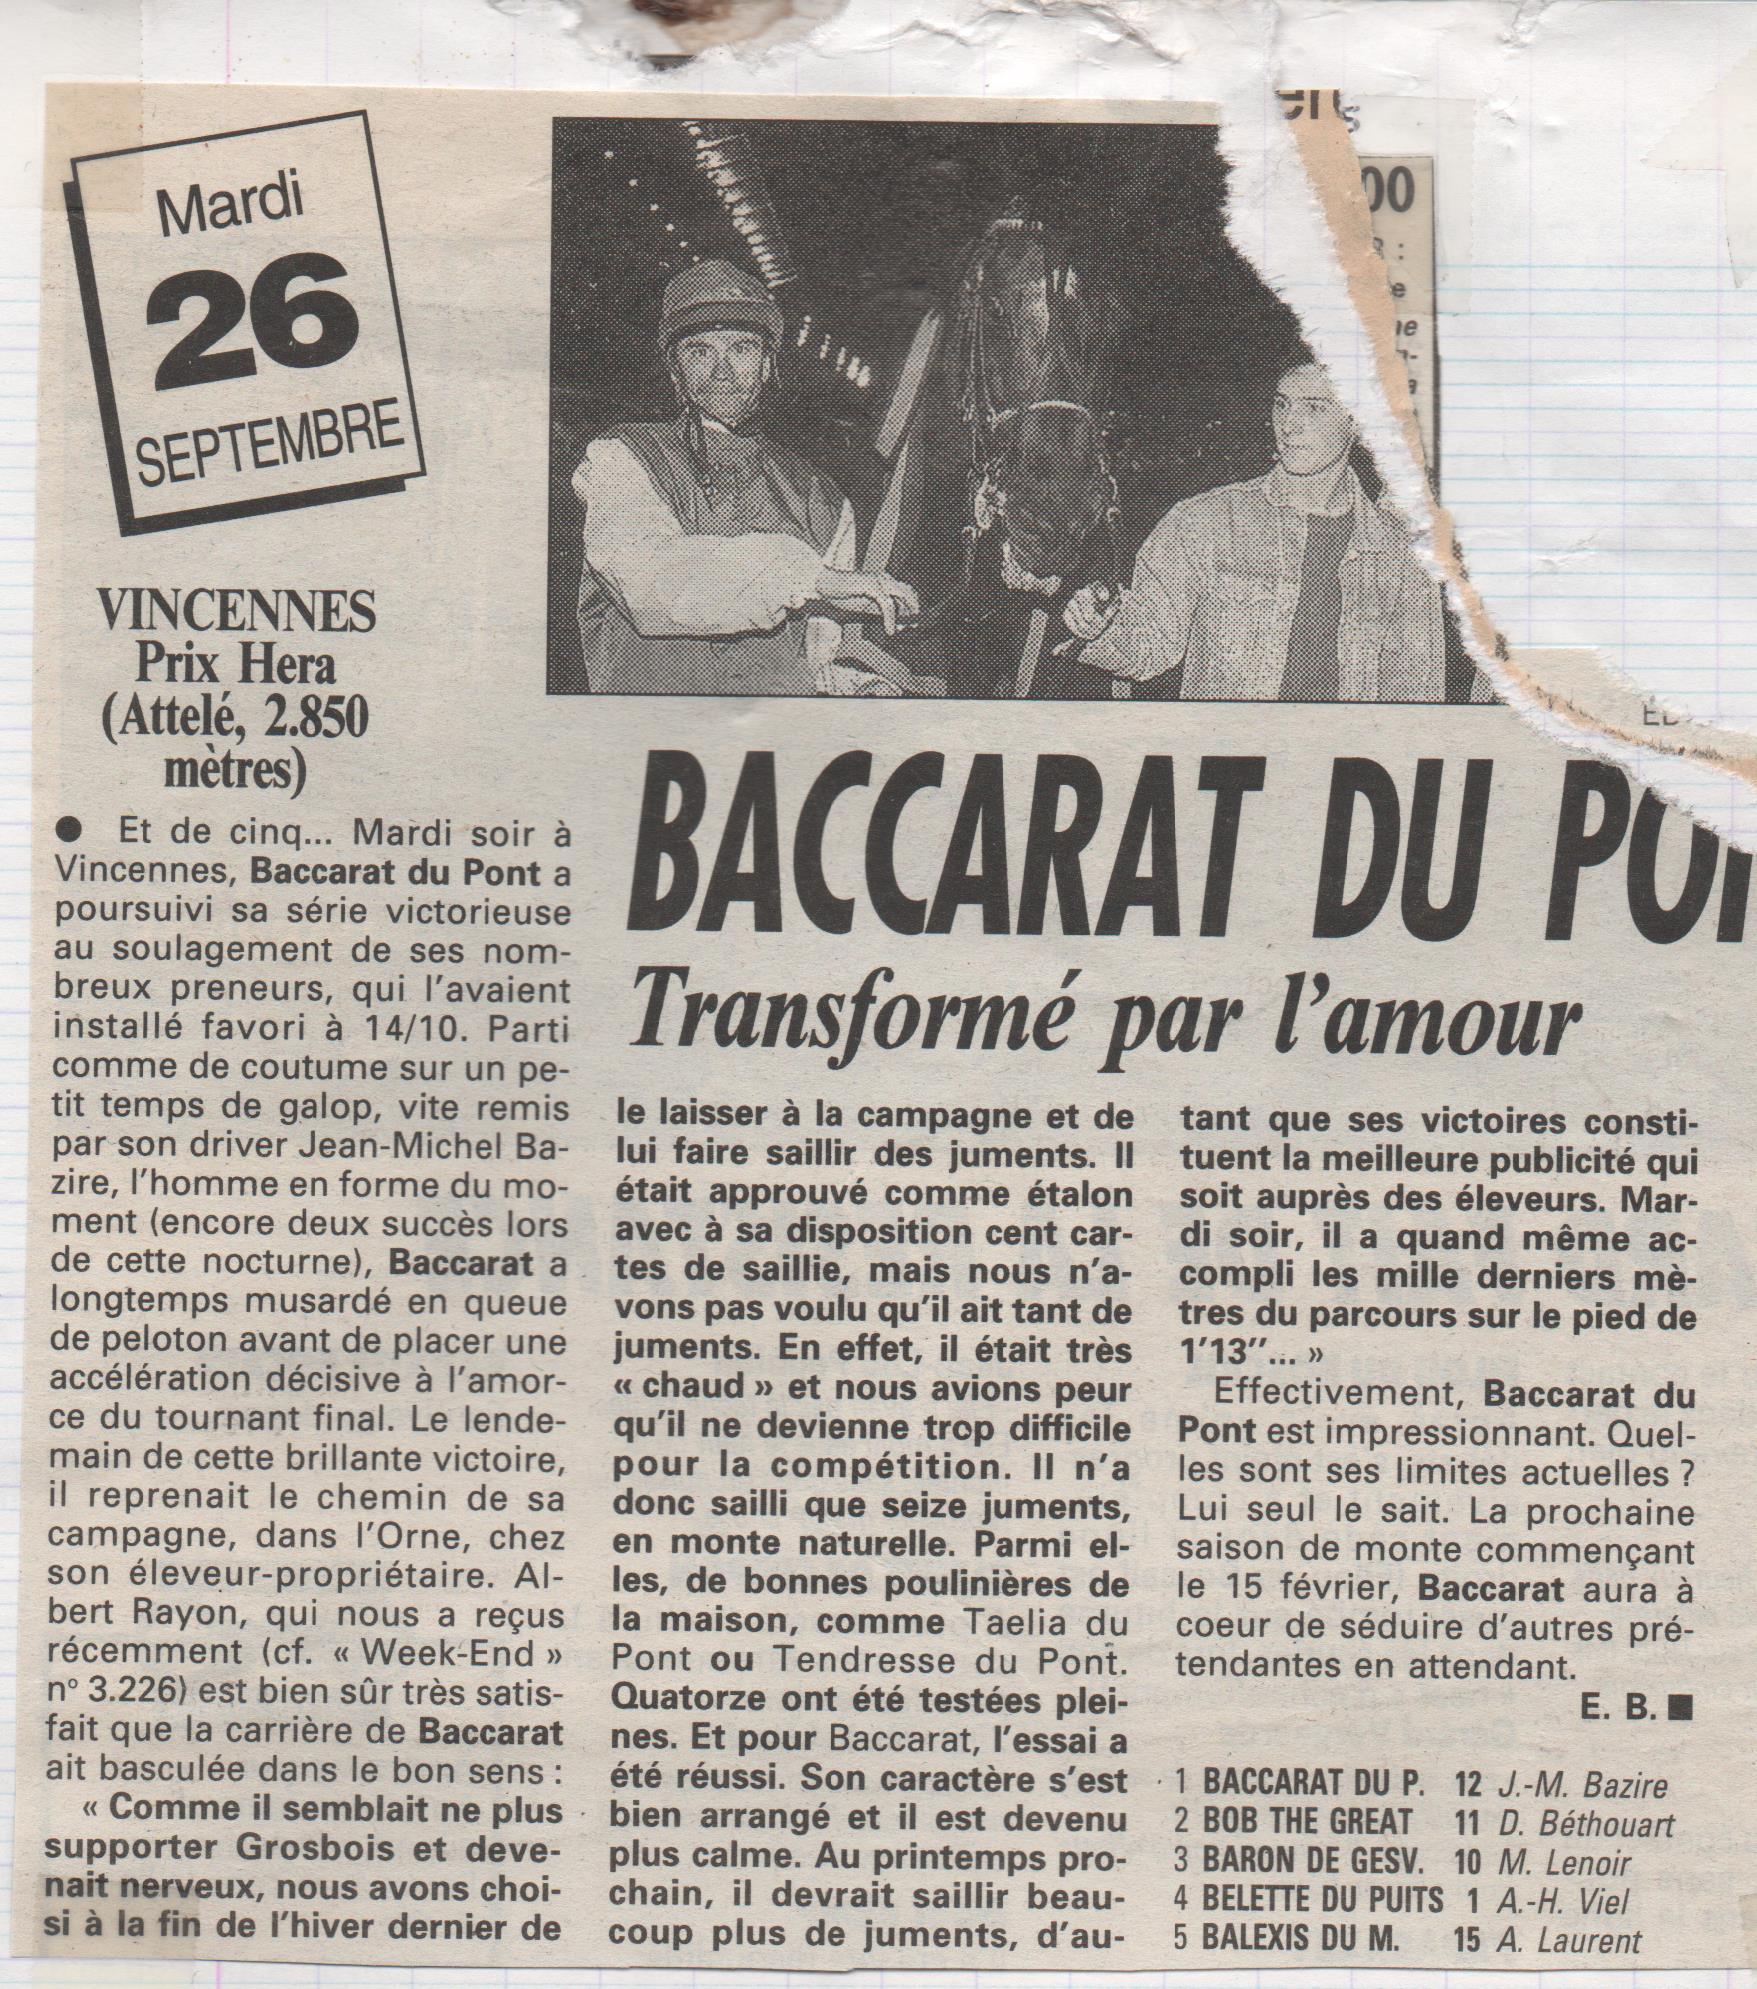 1995 09 26 Baccarat du Pont Prix Hera (1).jpg